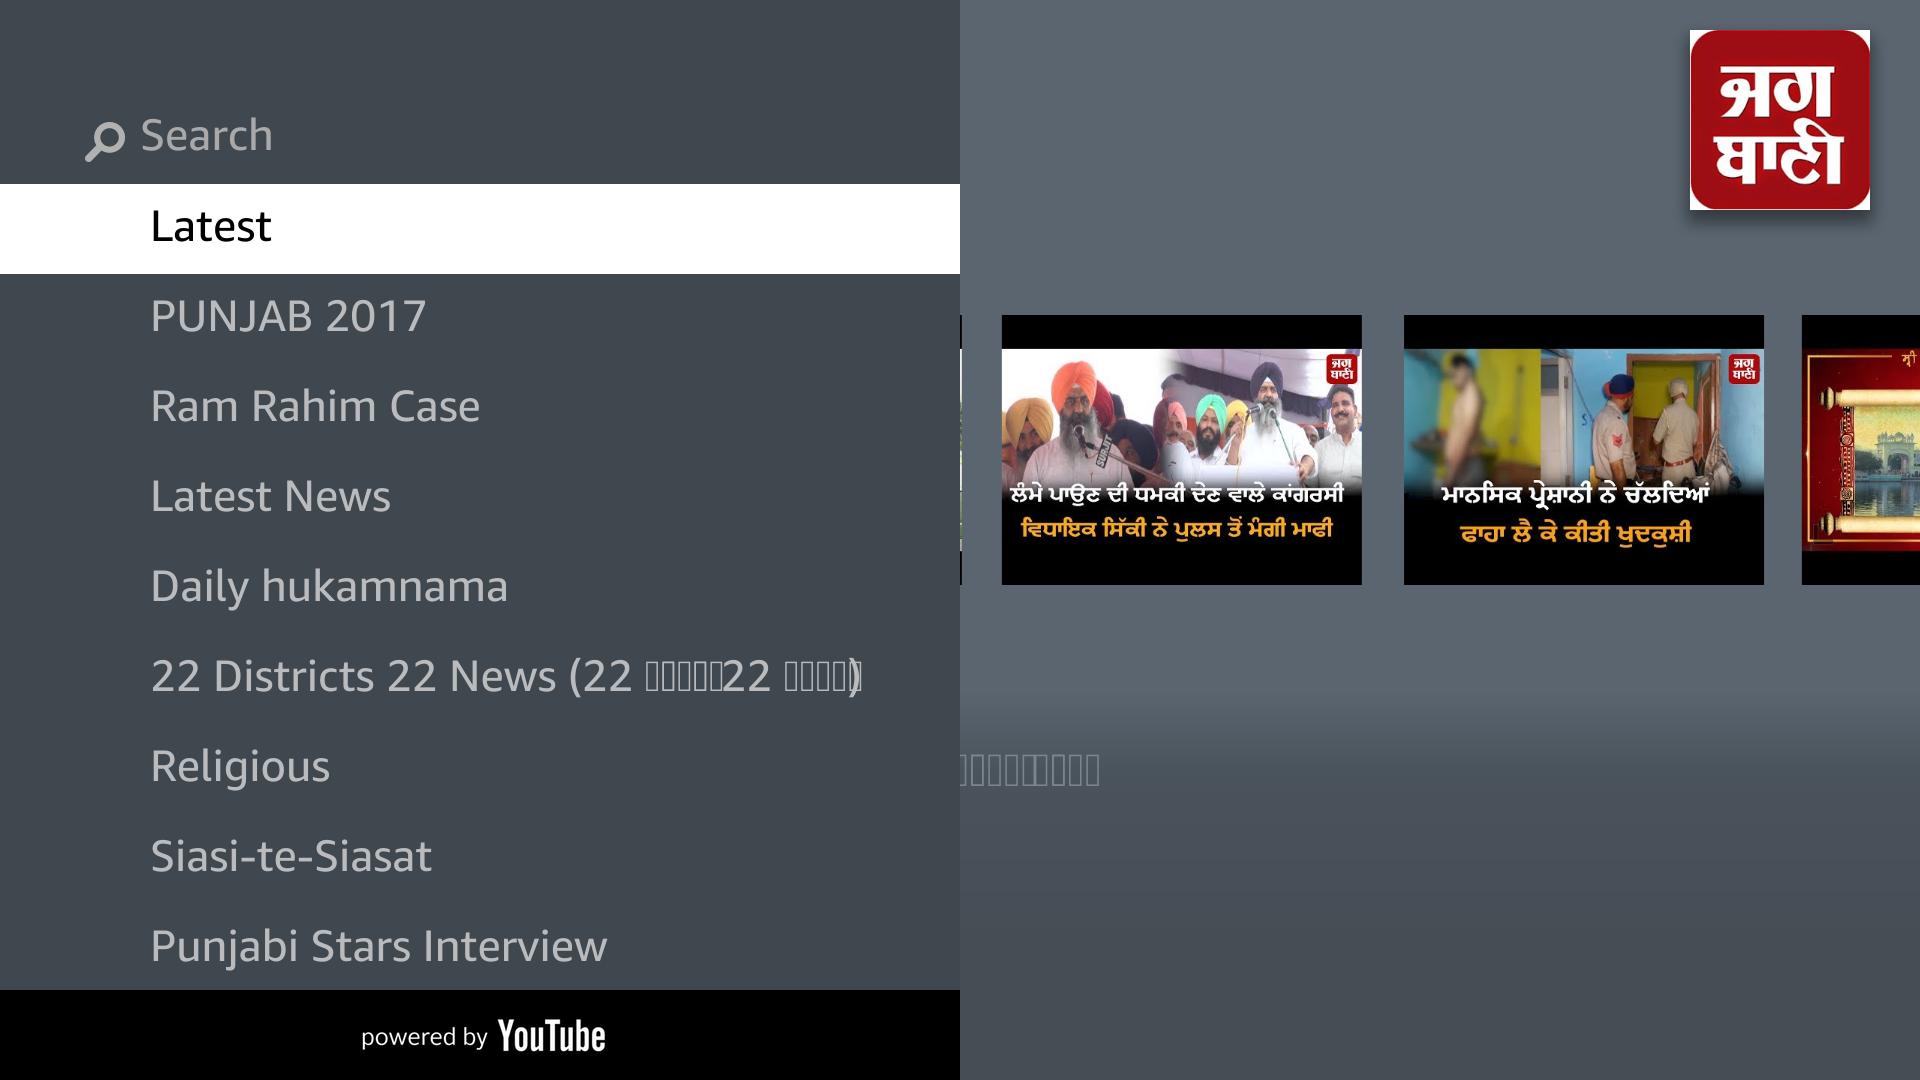 Online-Dating-Seiten punjabi Dating-Website in nairobi